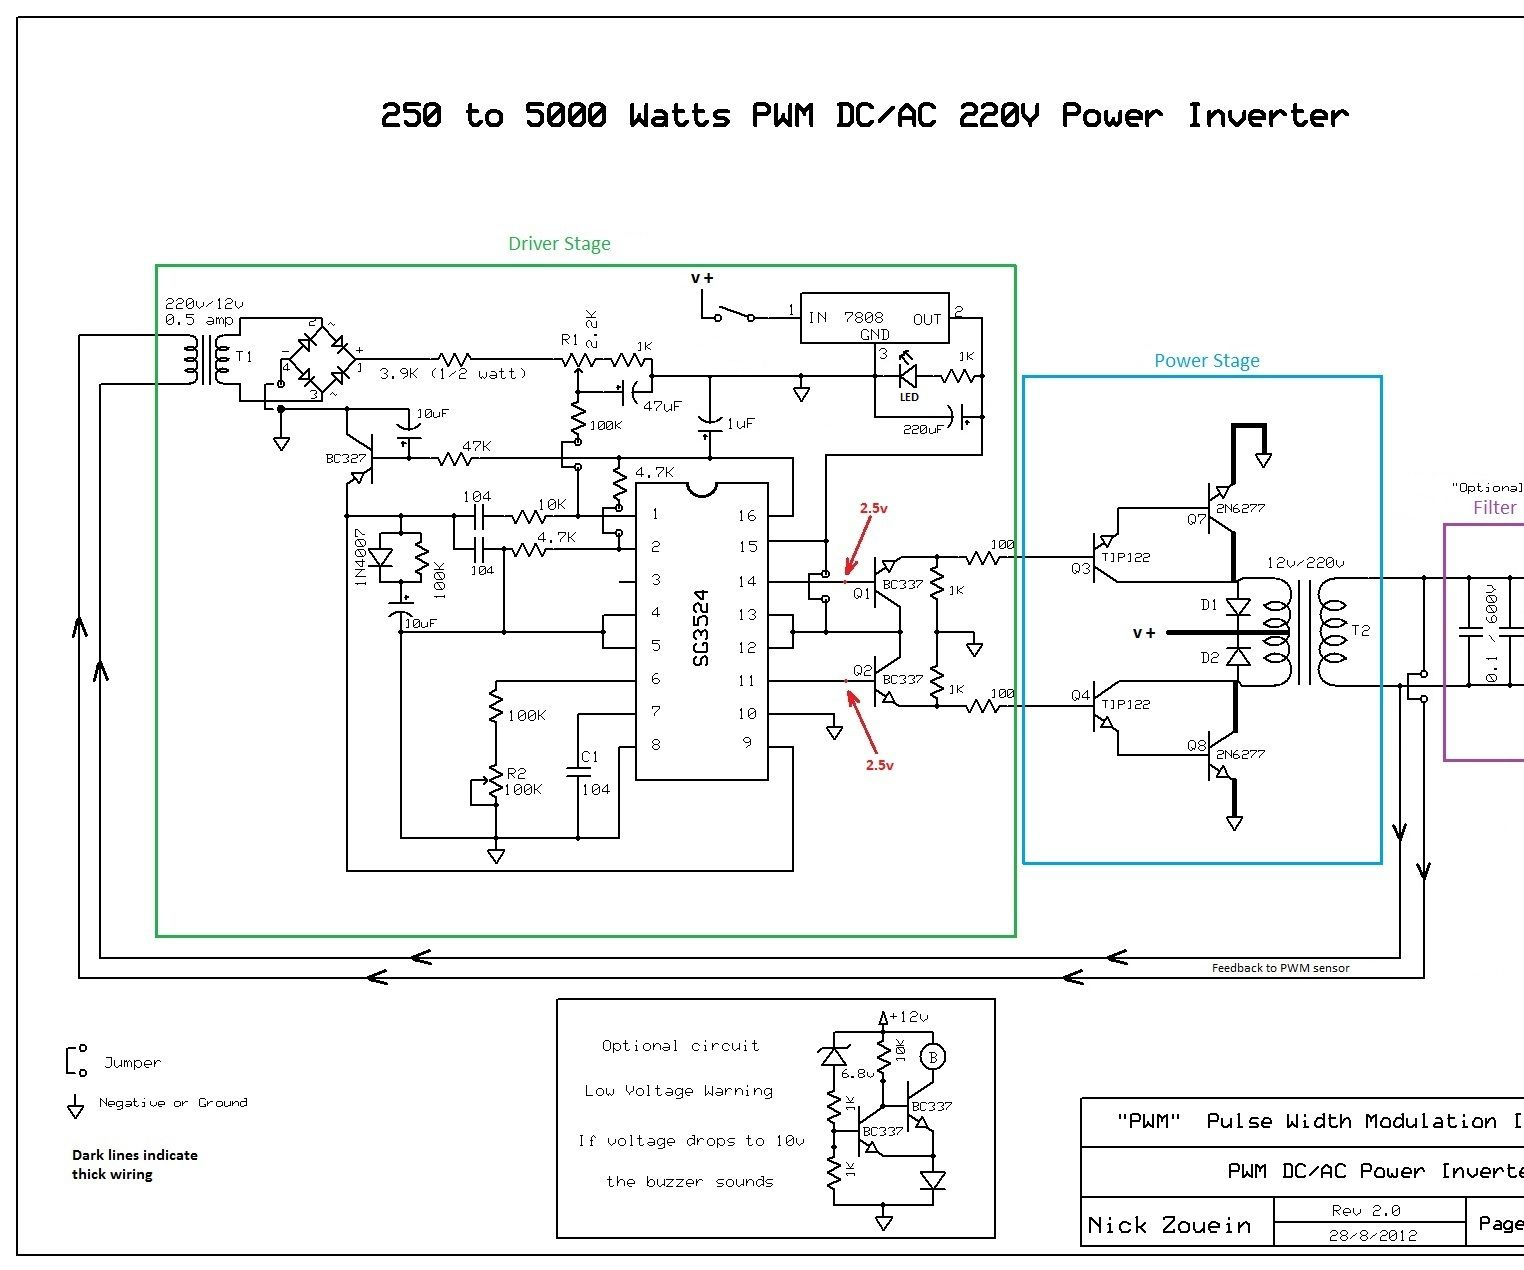 medium resolution of automated logic wiring diagram wiring libraryautomated logic wiring diagram